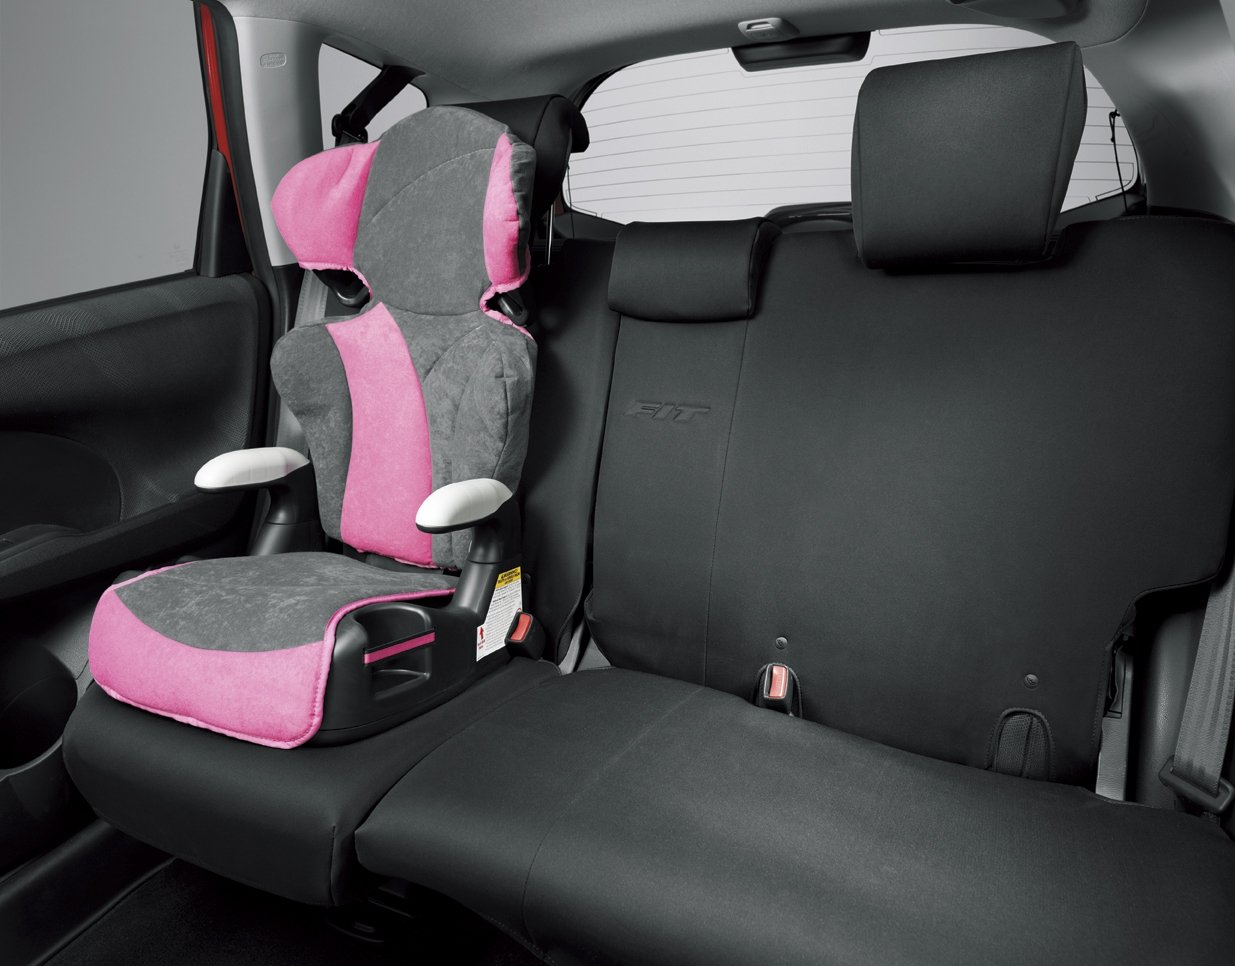 Amazon Honda Fit Genuine Factory OEM 08P32 TK6 110 Rear Seat Cover 2013 Automotive